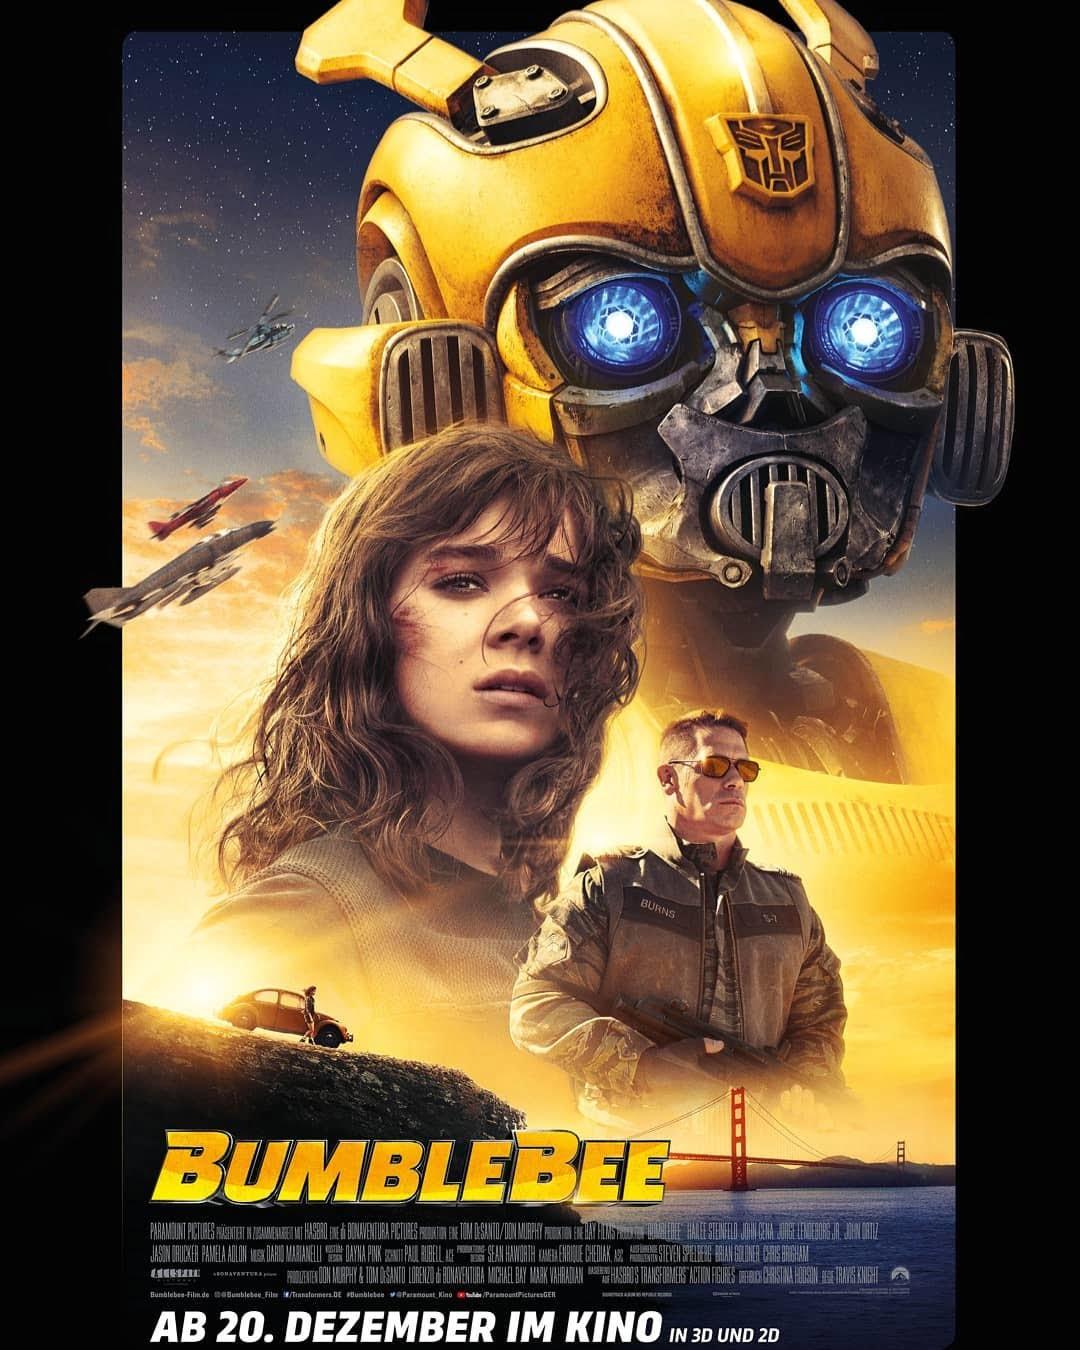 Plakat promujący film BumbleBee